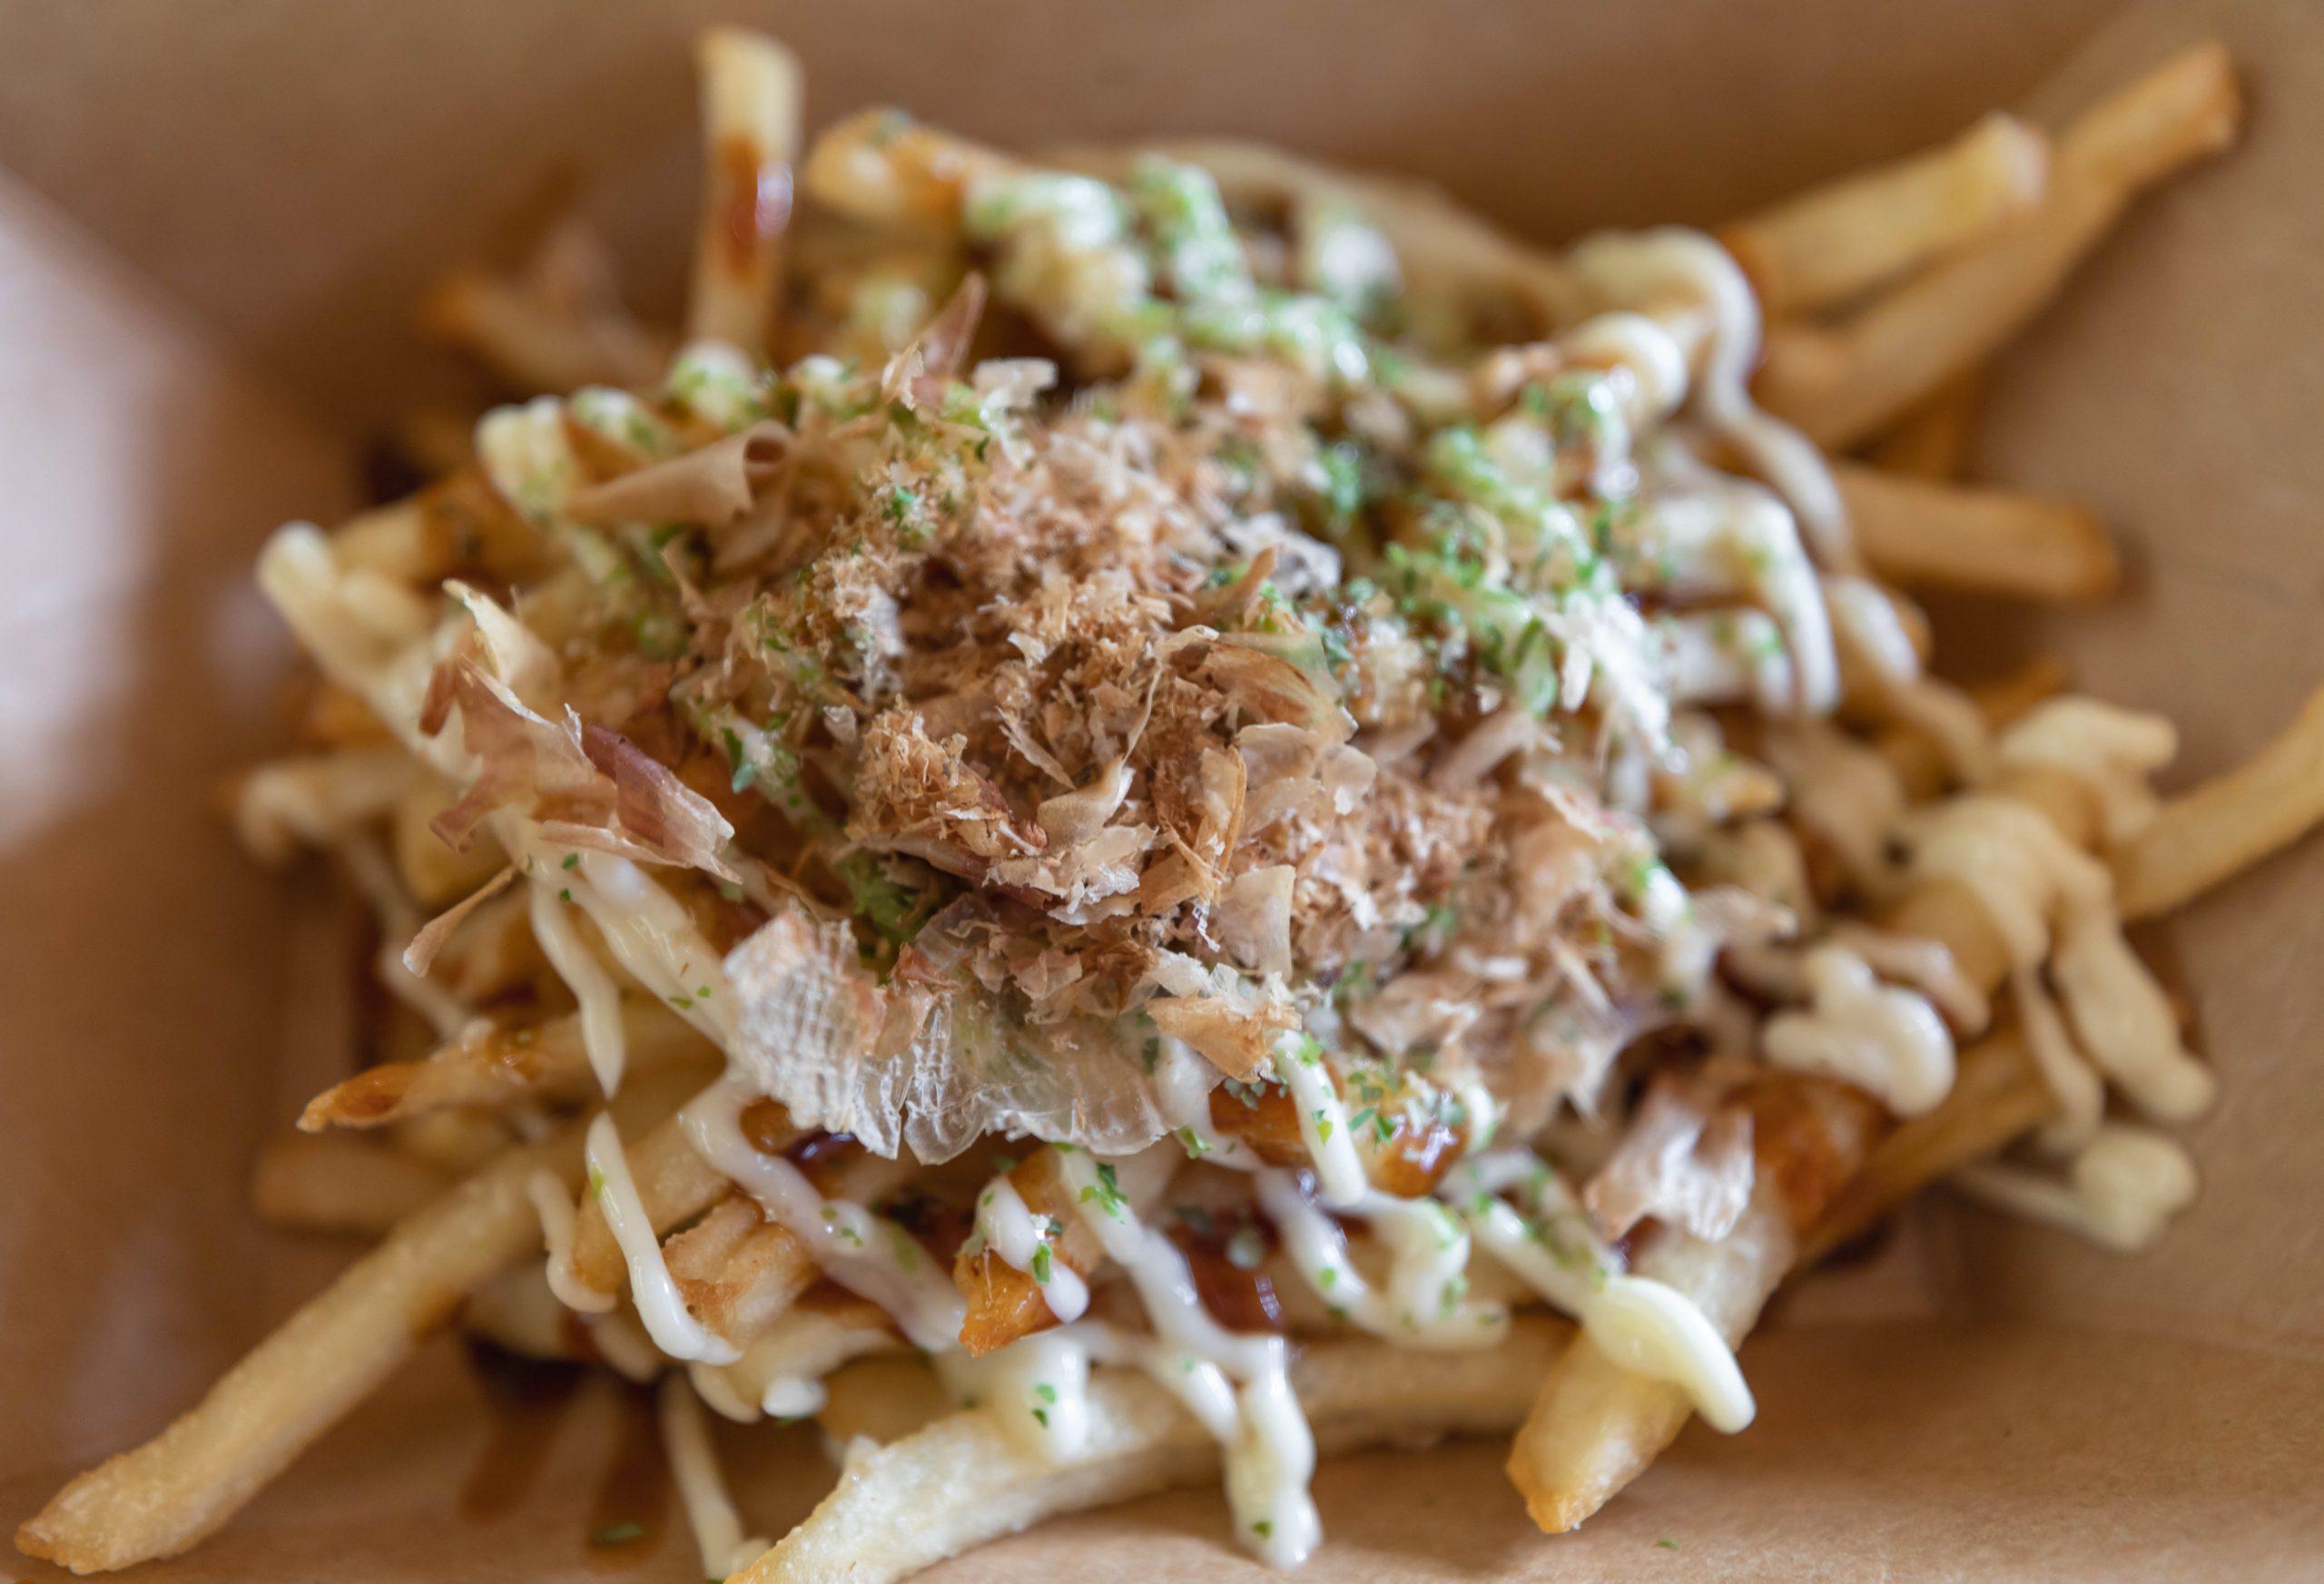 Japan Okoniyaki Fries Best Things to Eat in Epcot Walt Disney World by Luxury Travel Writer & Photographer Annie Fairfax